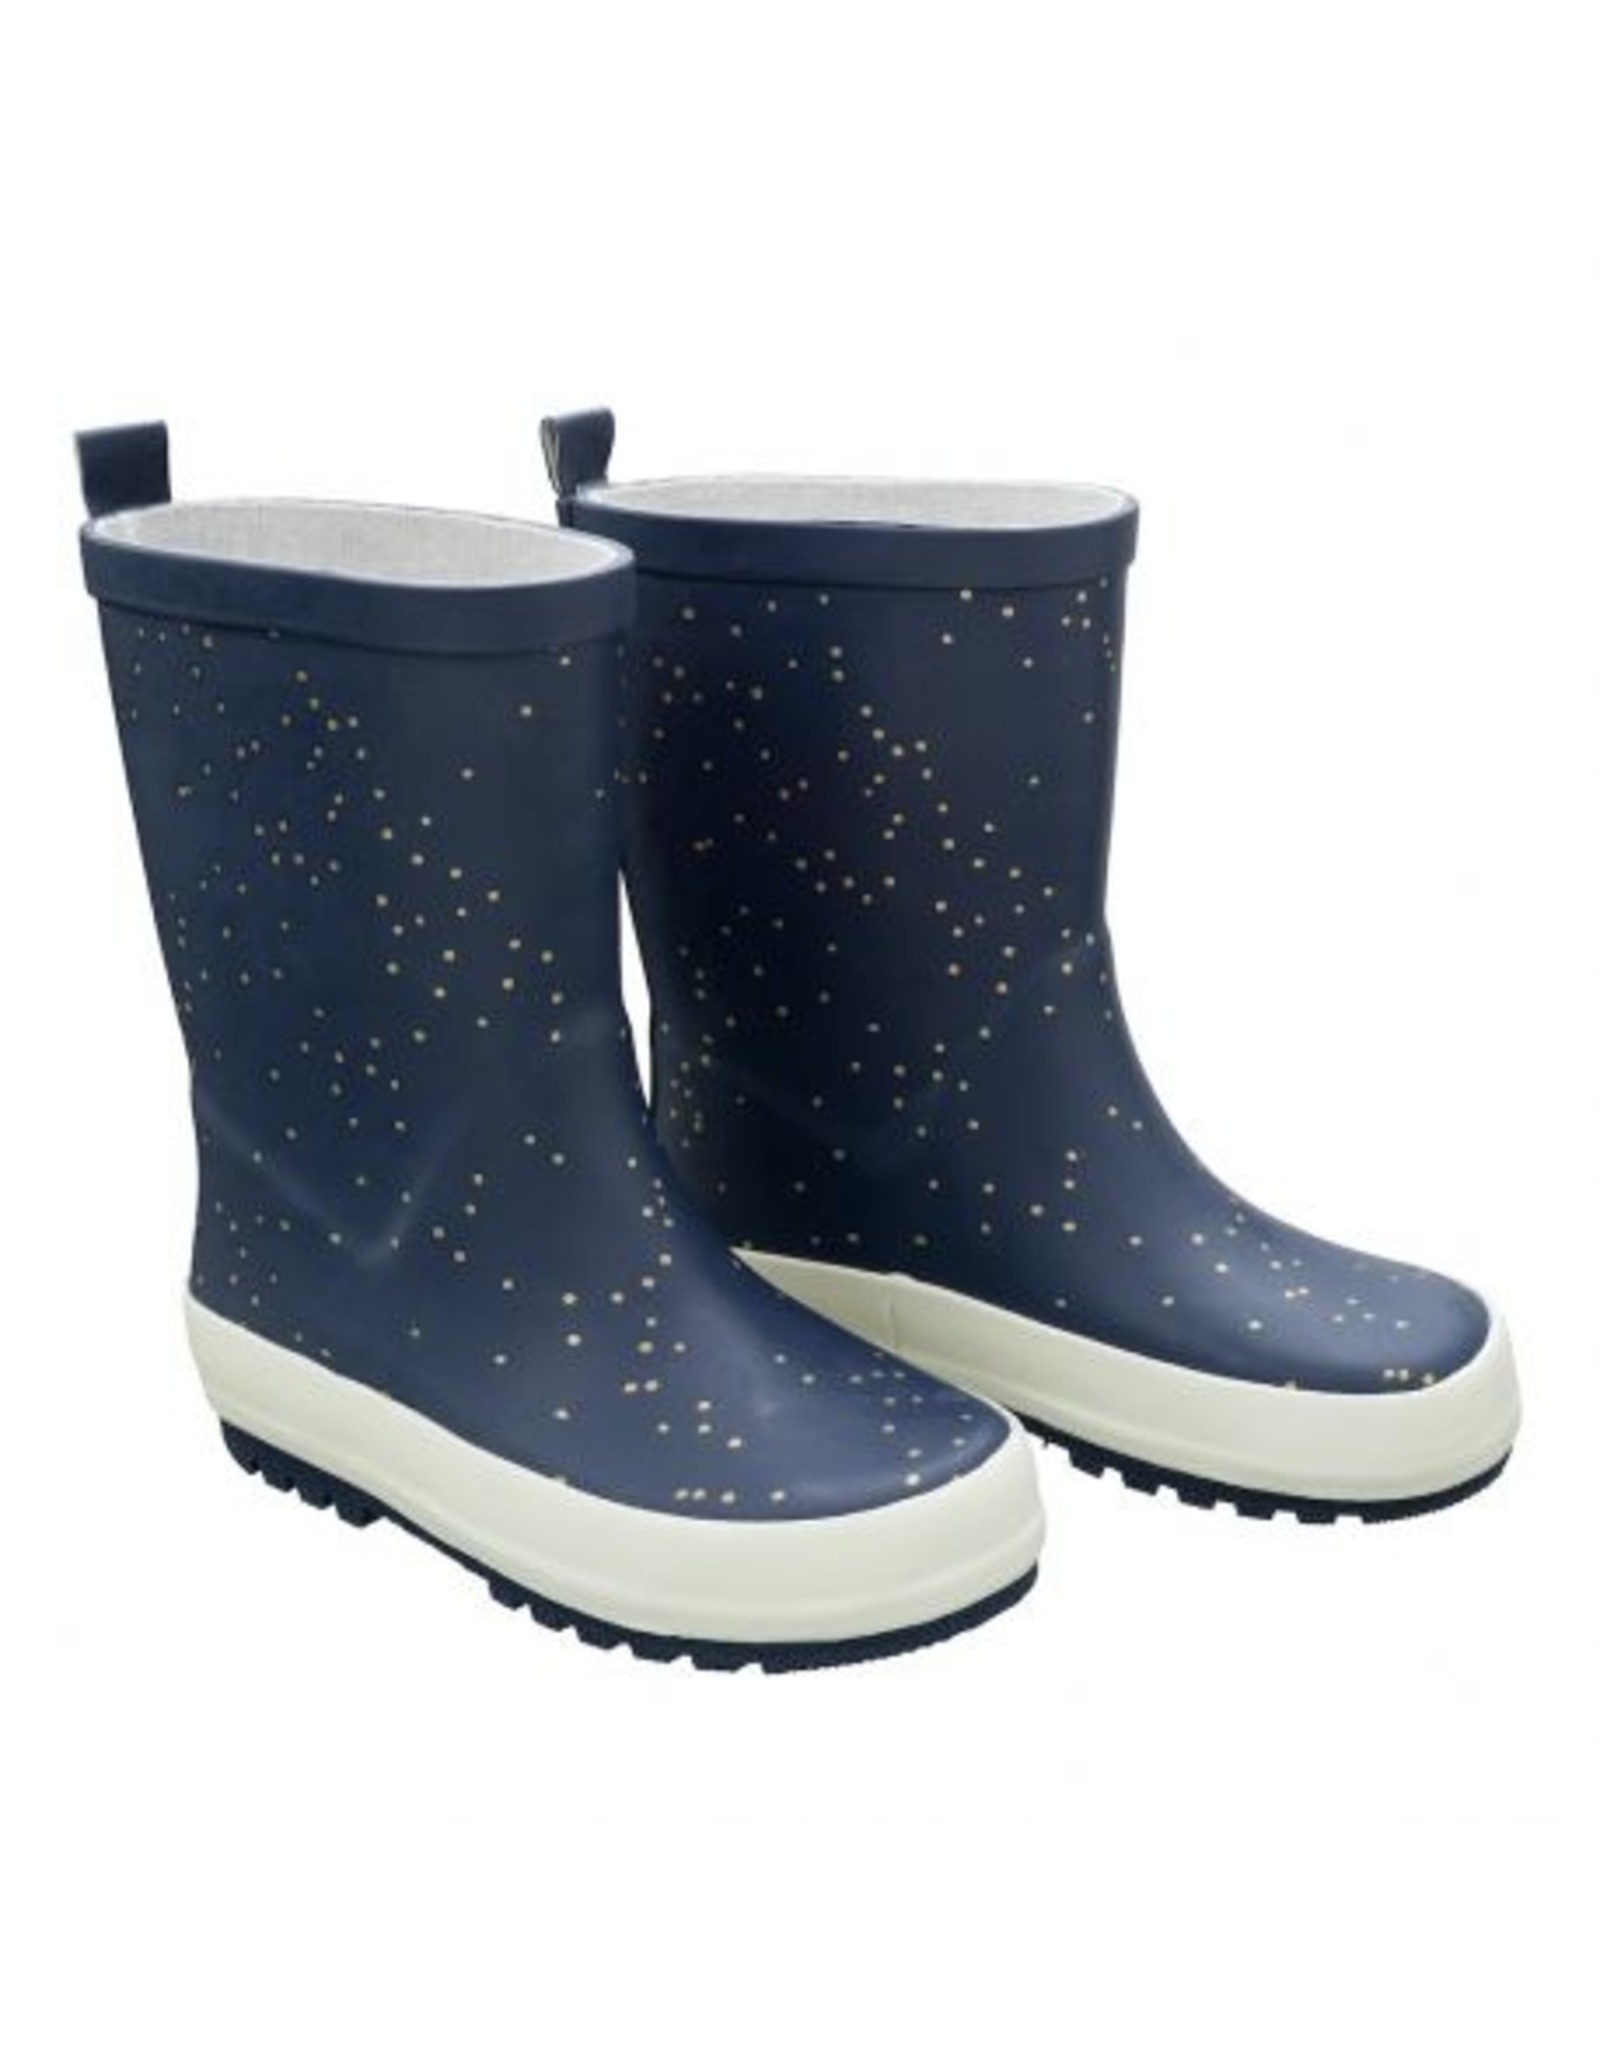 Fresk Bottes de pluie - Indigo Dots